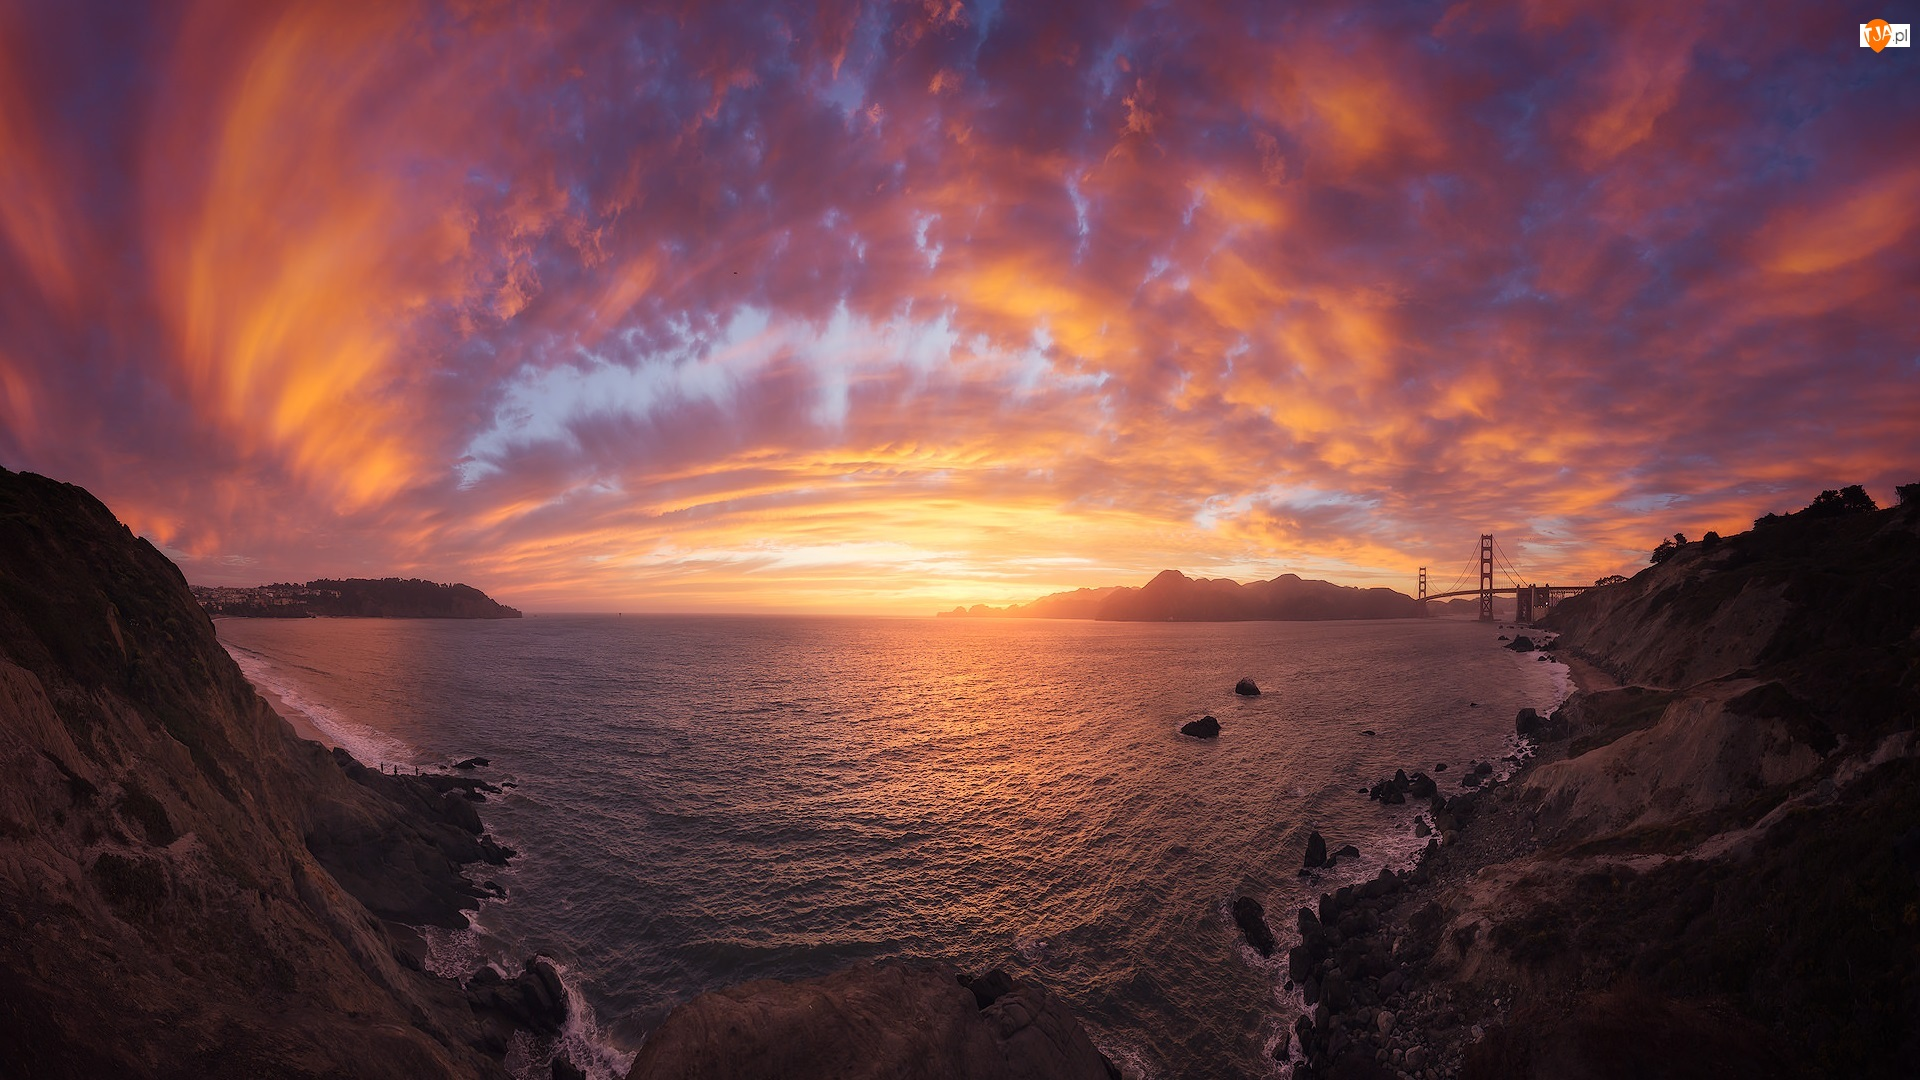 Cieśnina Golden Gate, Stany Zjednoczone, Most, Chmury, Kalifornia, Golden Gate Bridge, Zachód słońca, San Francisco